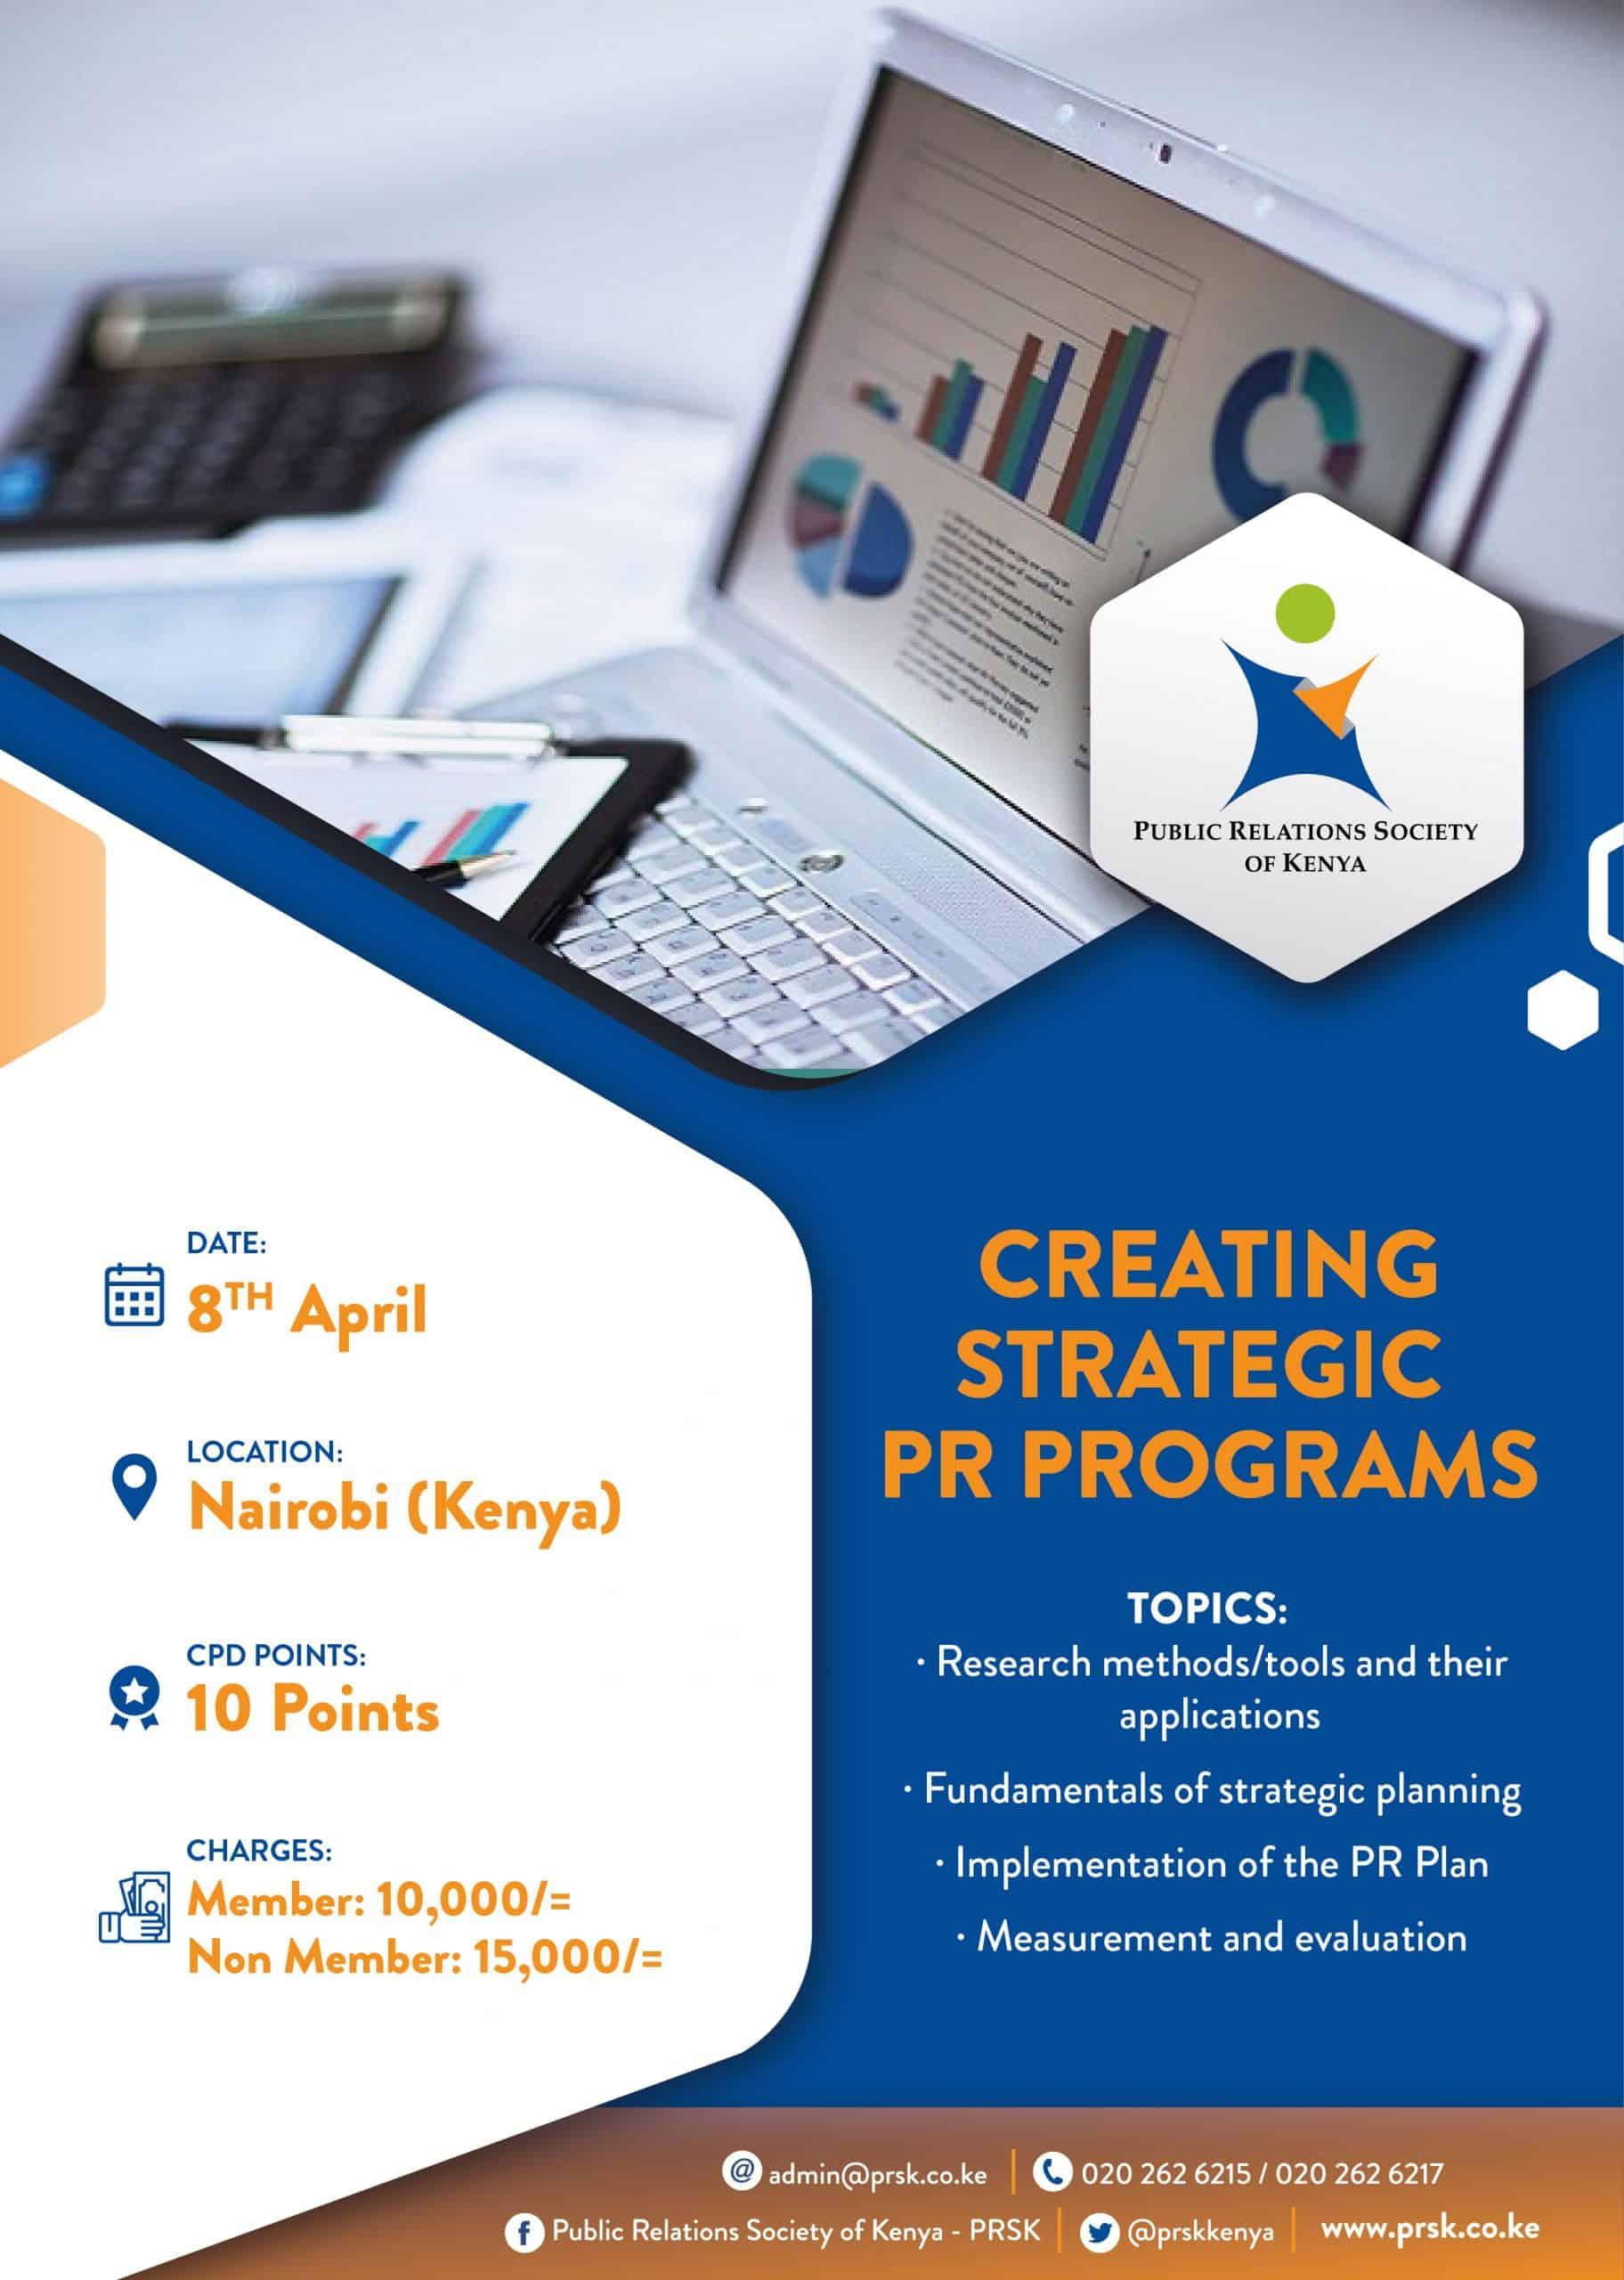 Creating Strategic PR Programs - Digital Poster